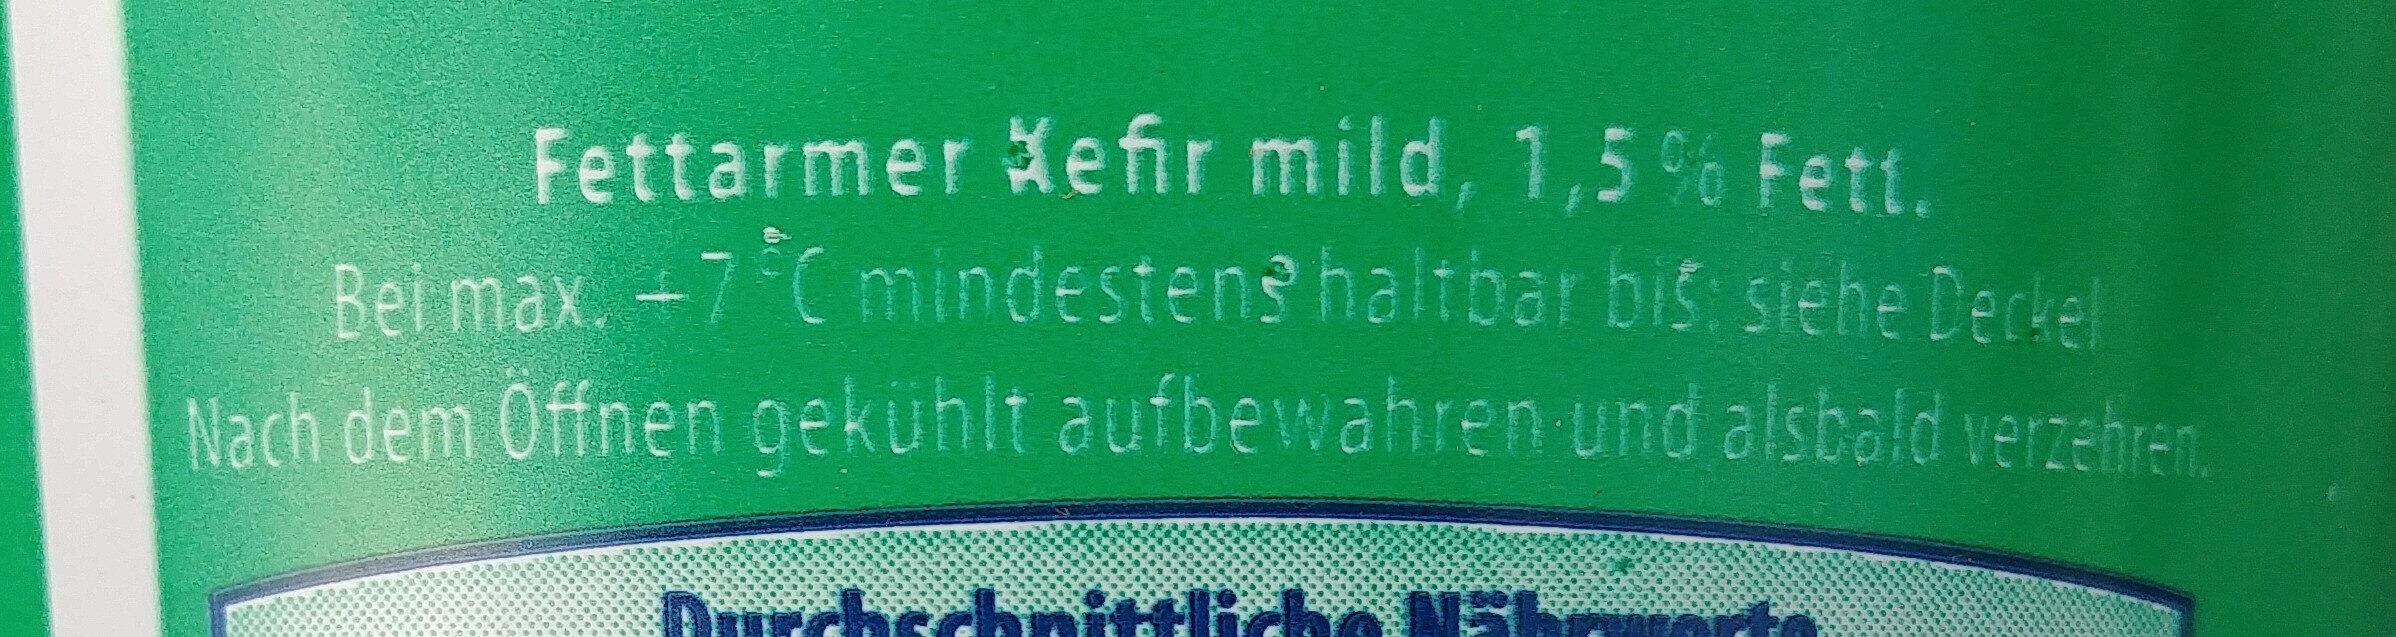 Fettemer Kefir mild 1,5% - Ingrédients - de